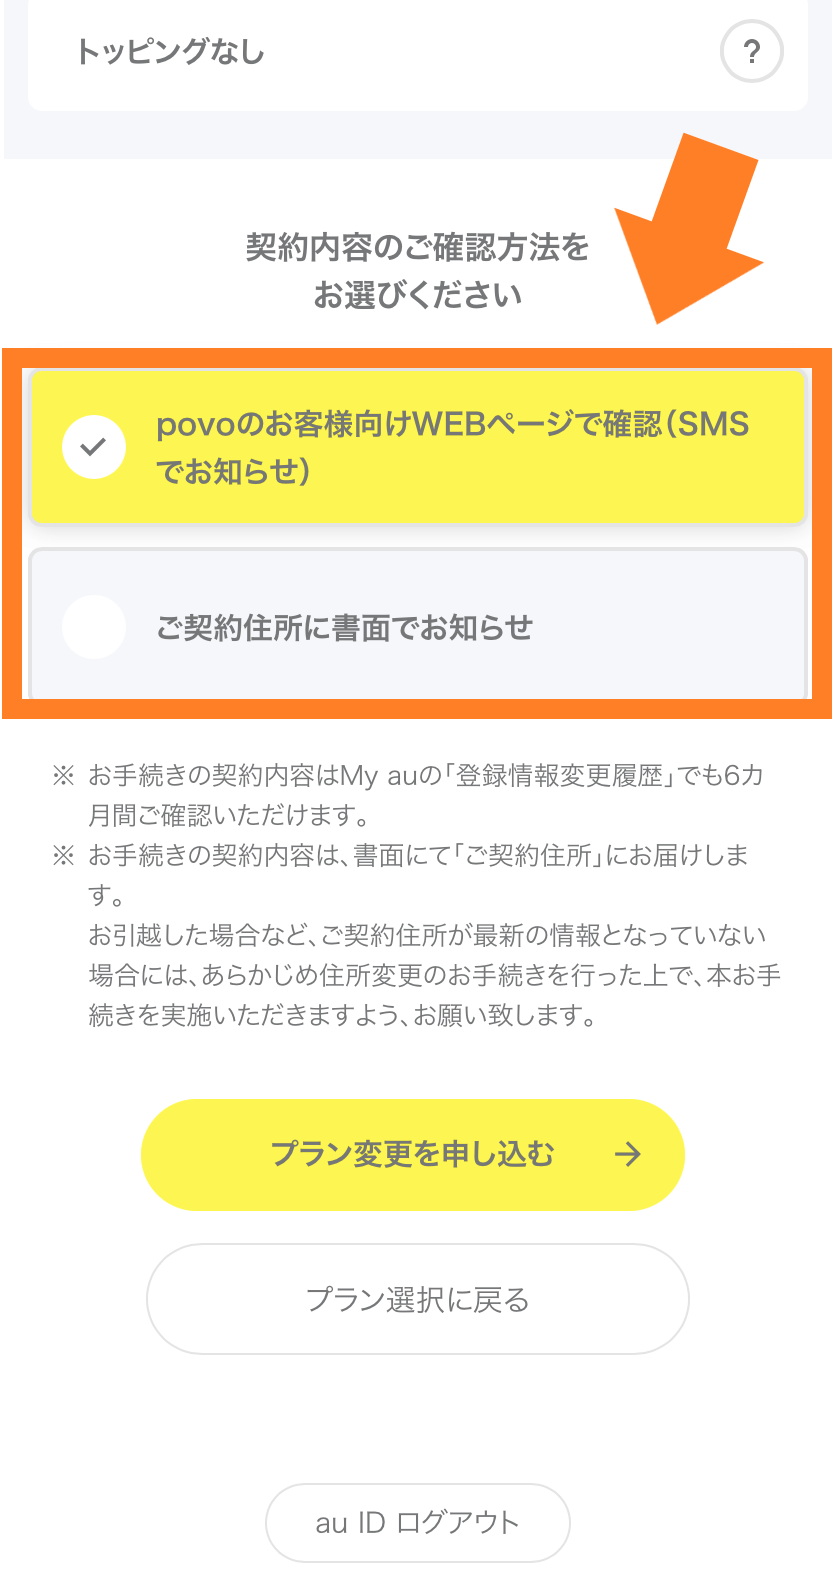 povo_申し込み_auからpovoへ申し込む方法手順10